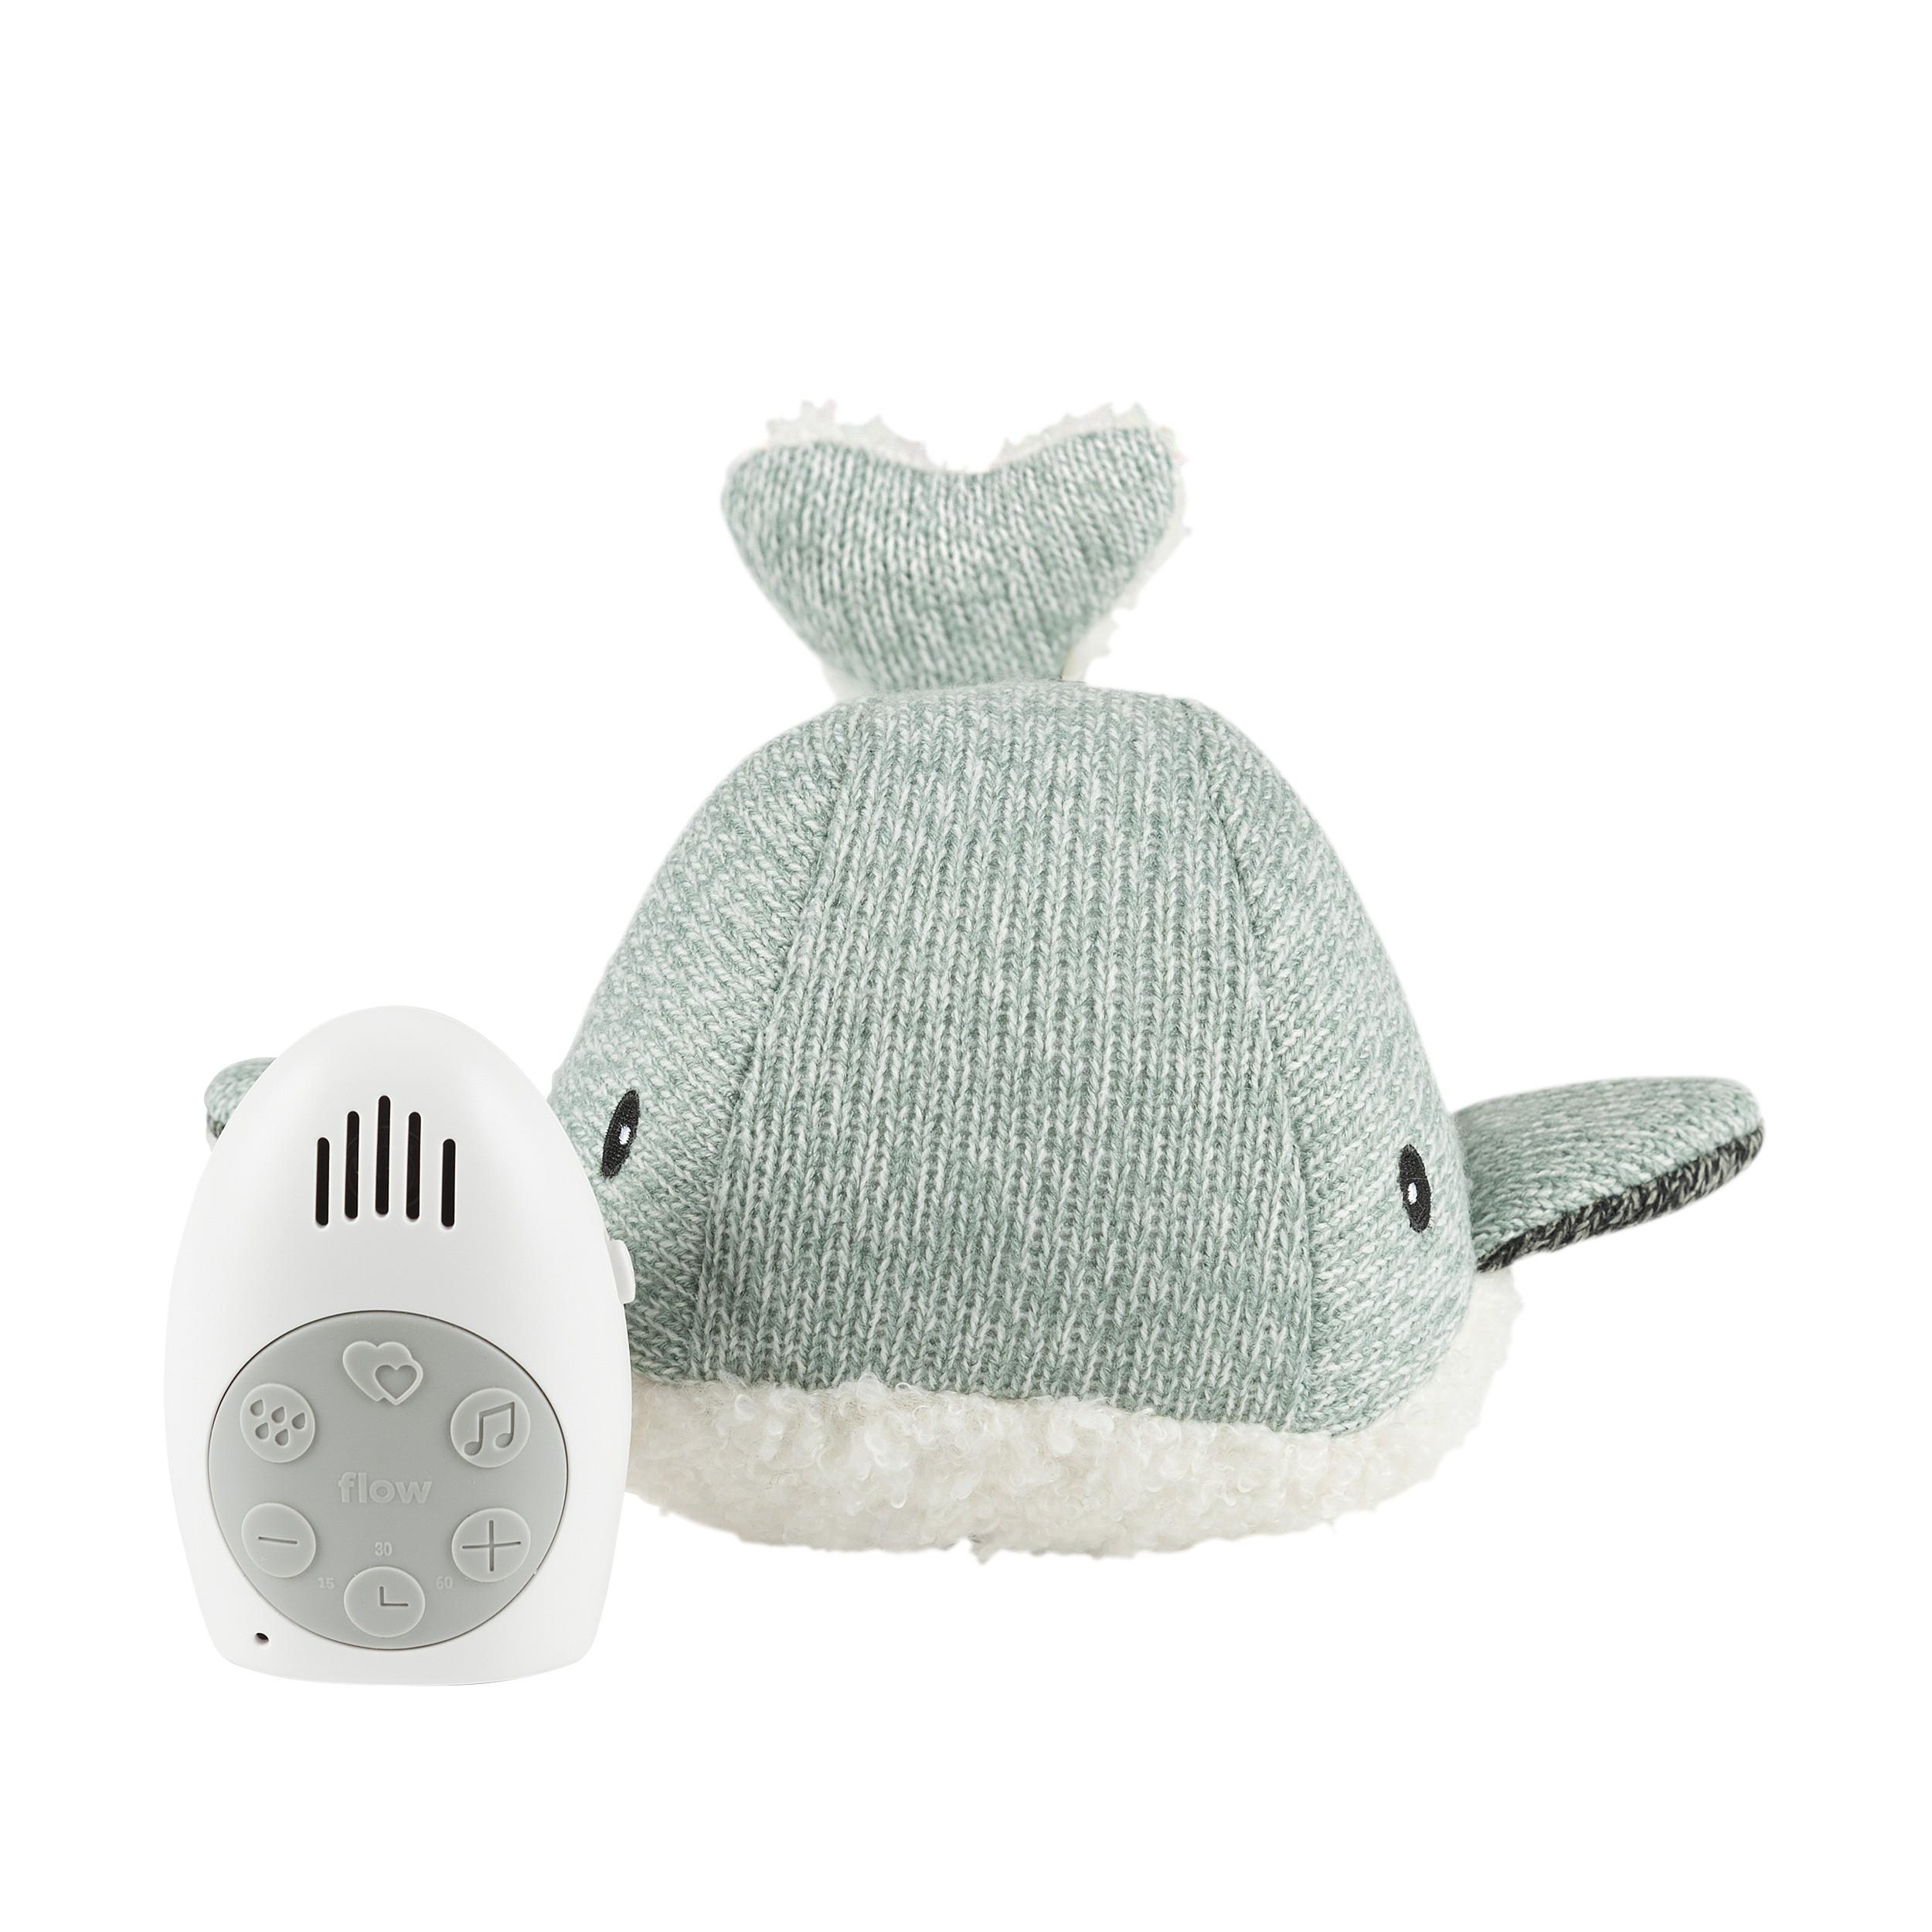 Flow - Hartslag comforter - Moby the Whale - groen